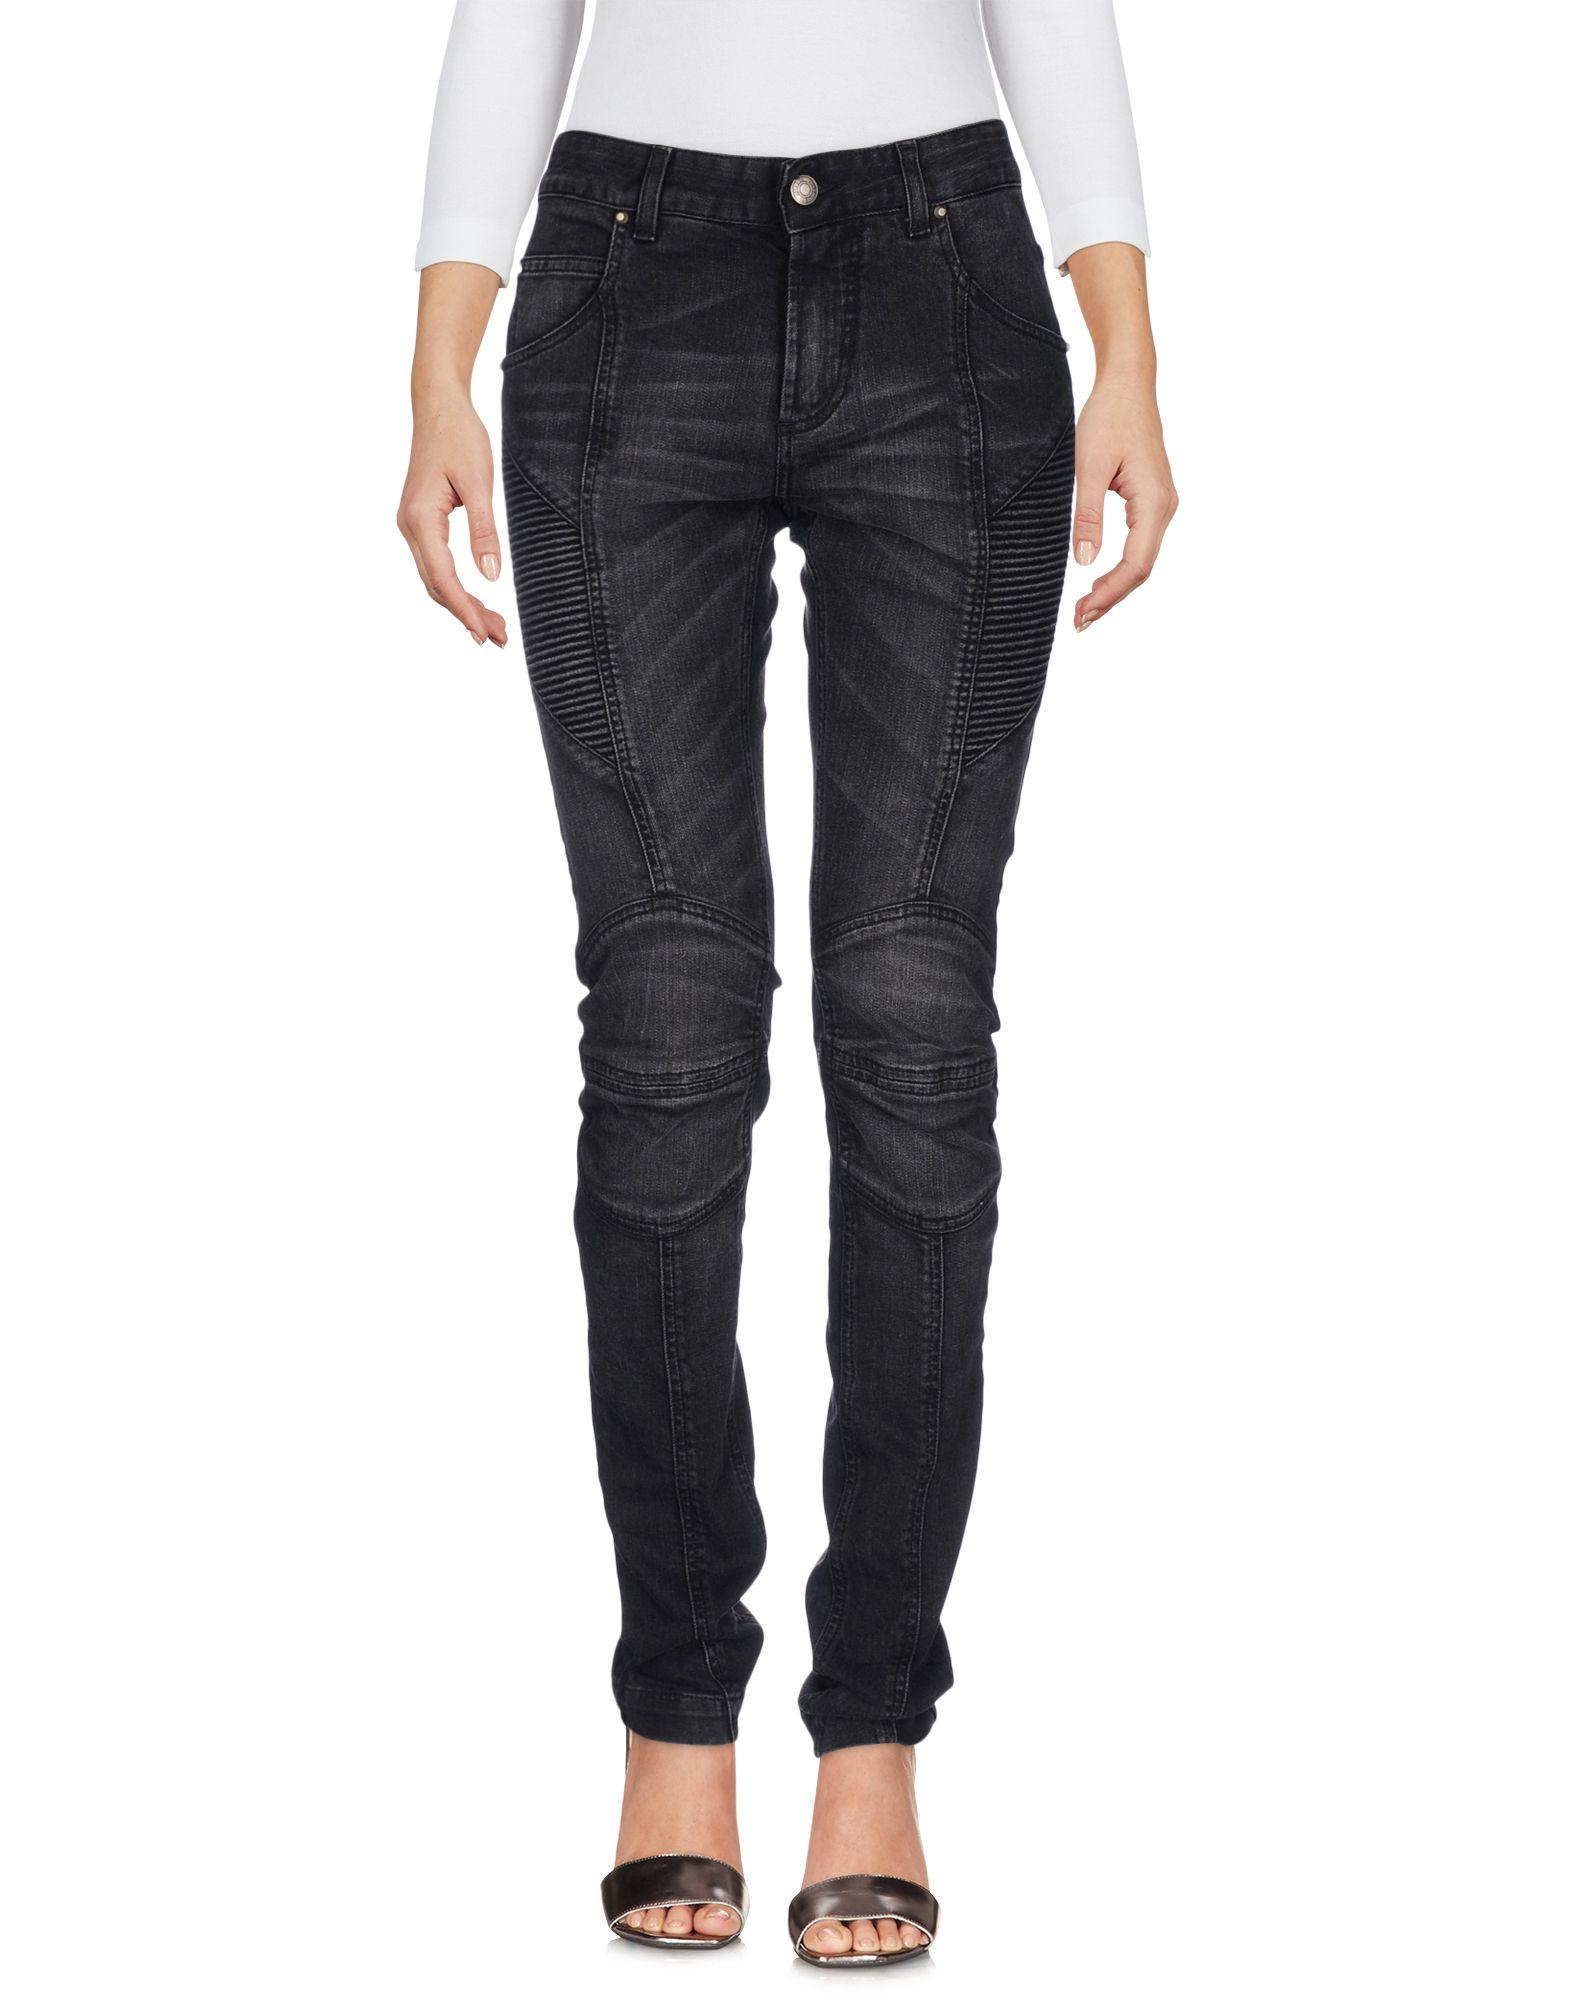 Pantaloni Jeans Pierre Balmain Donna - Acquista online su UyhGP